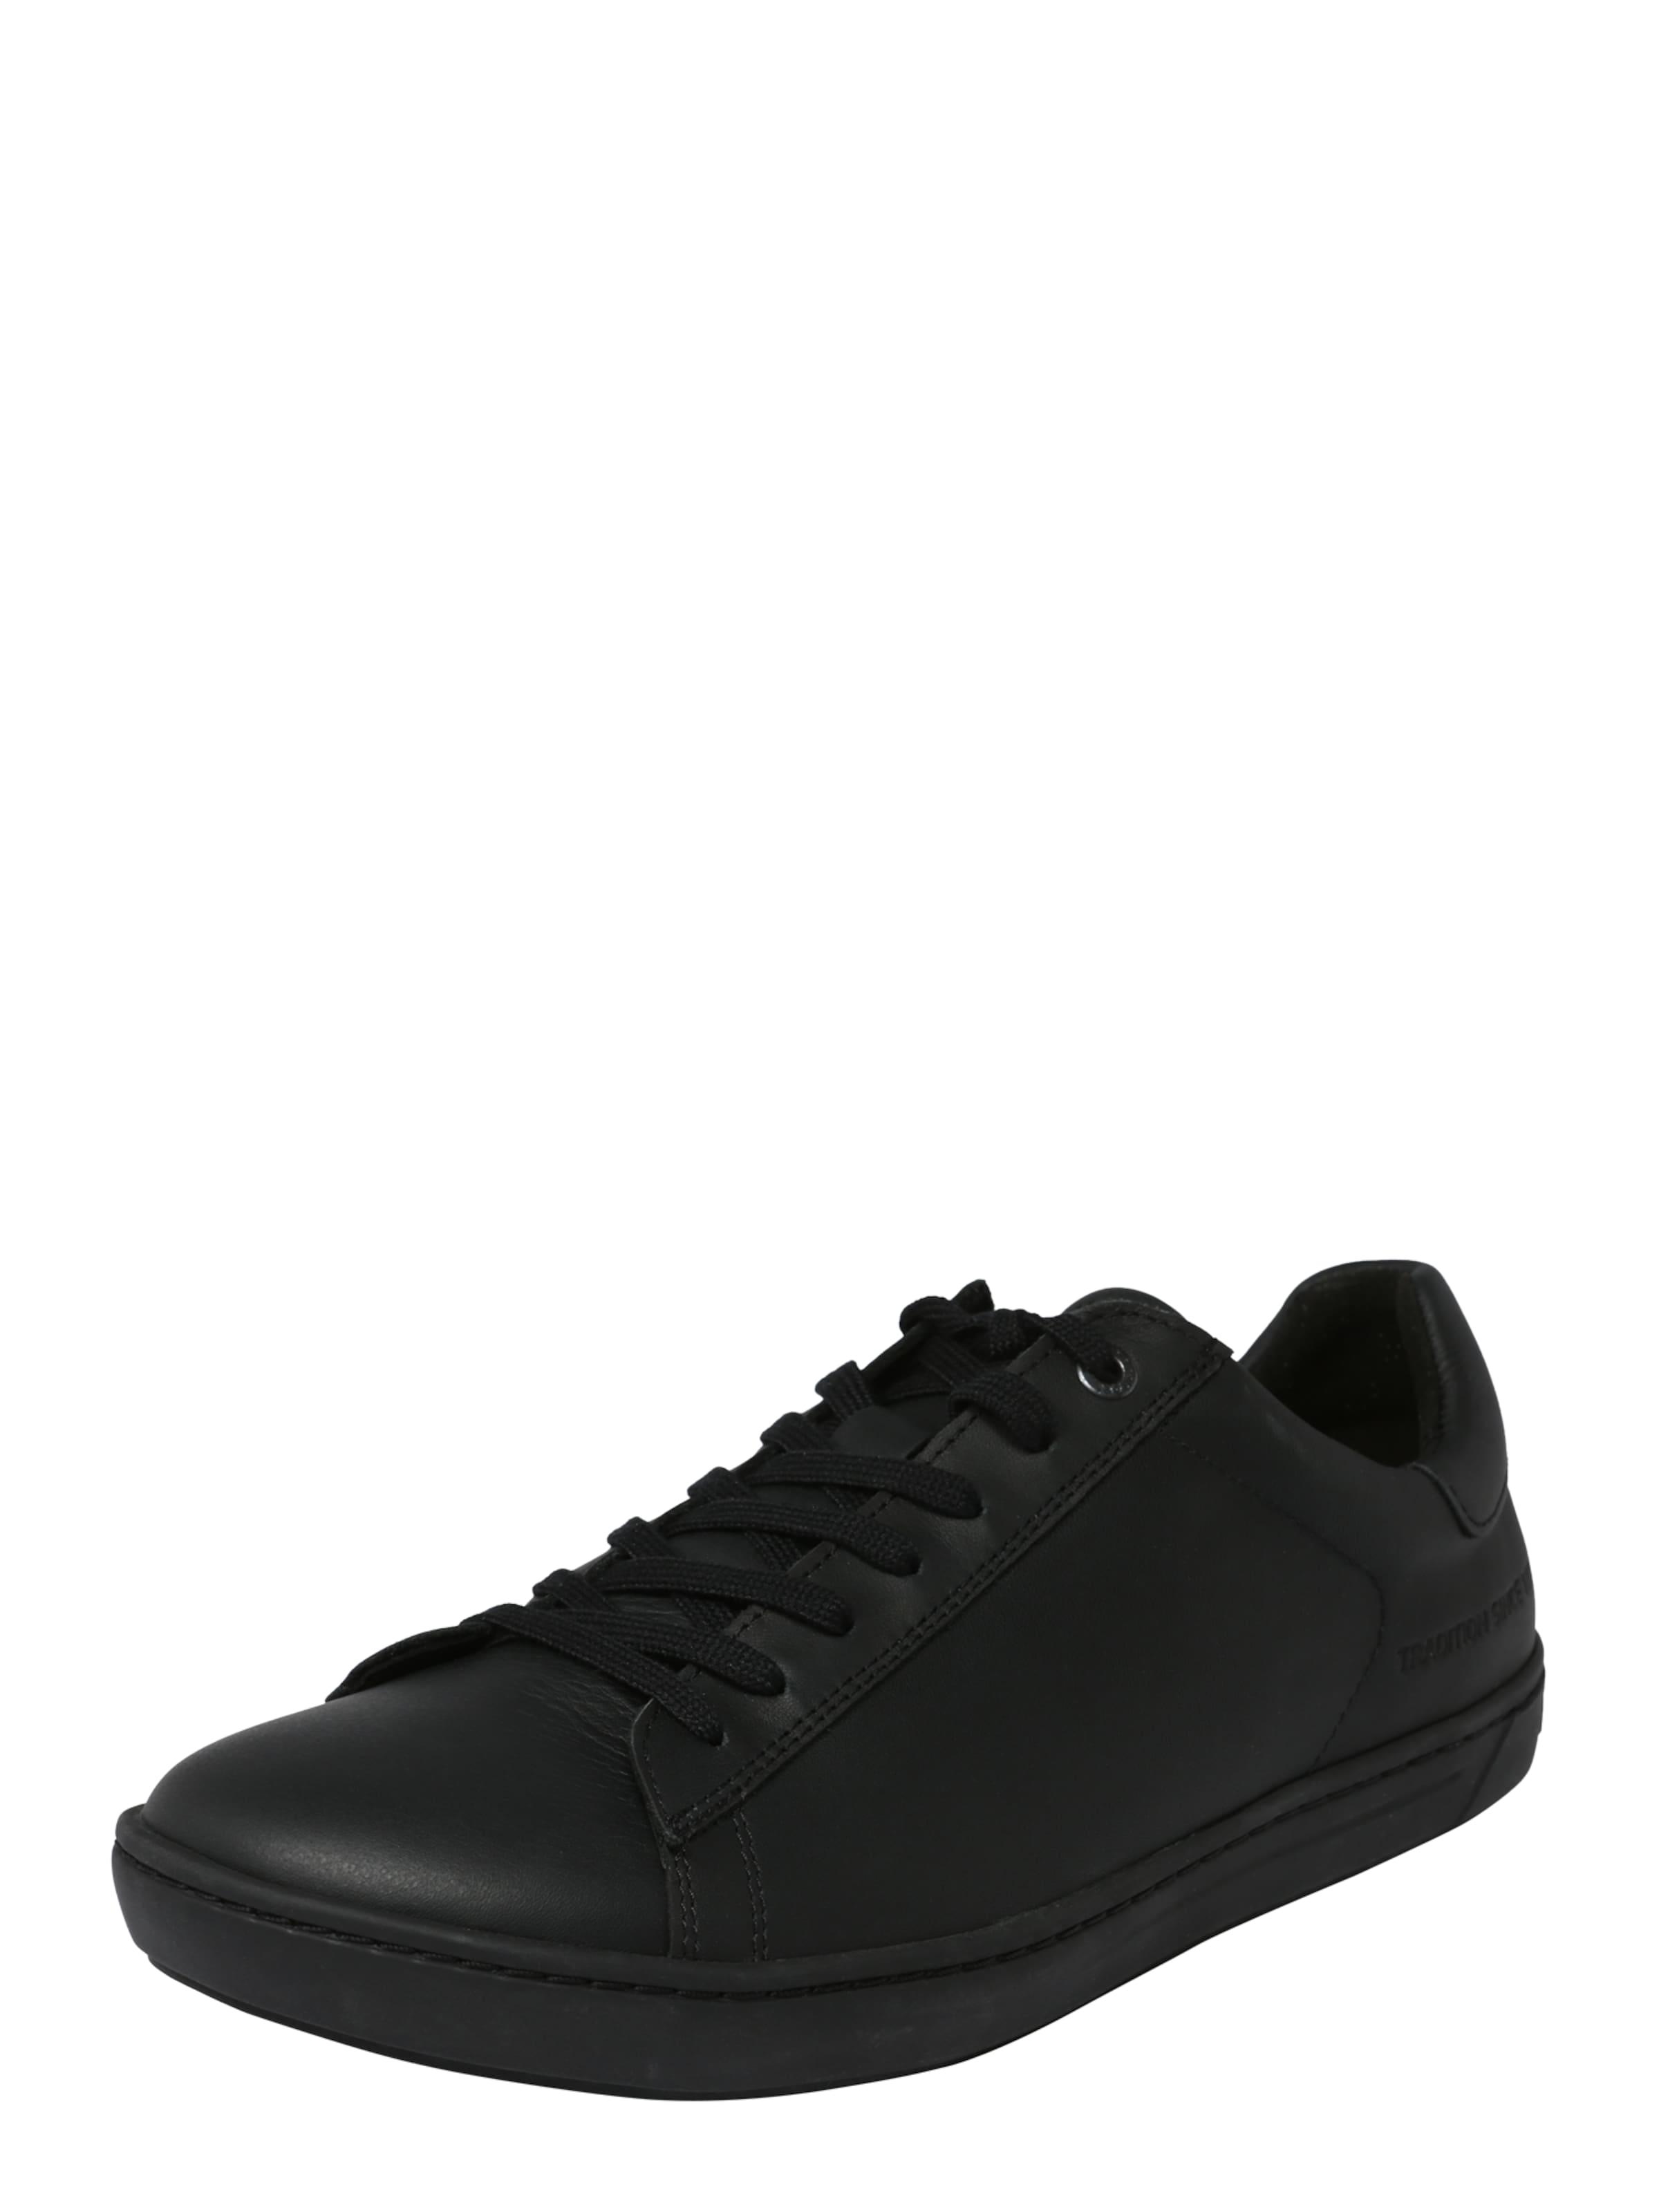 Men' In 'levin Sneaker Schwarz Birkenstock 5L34RjA